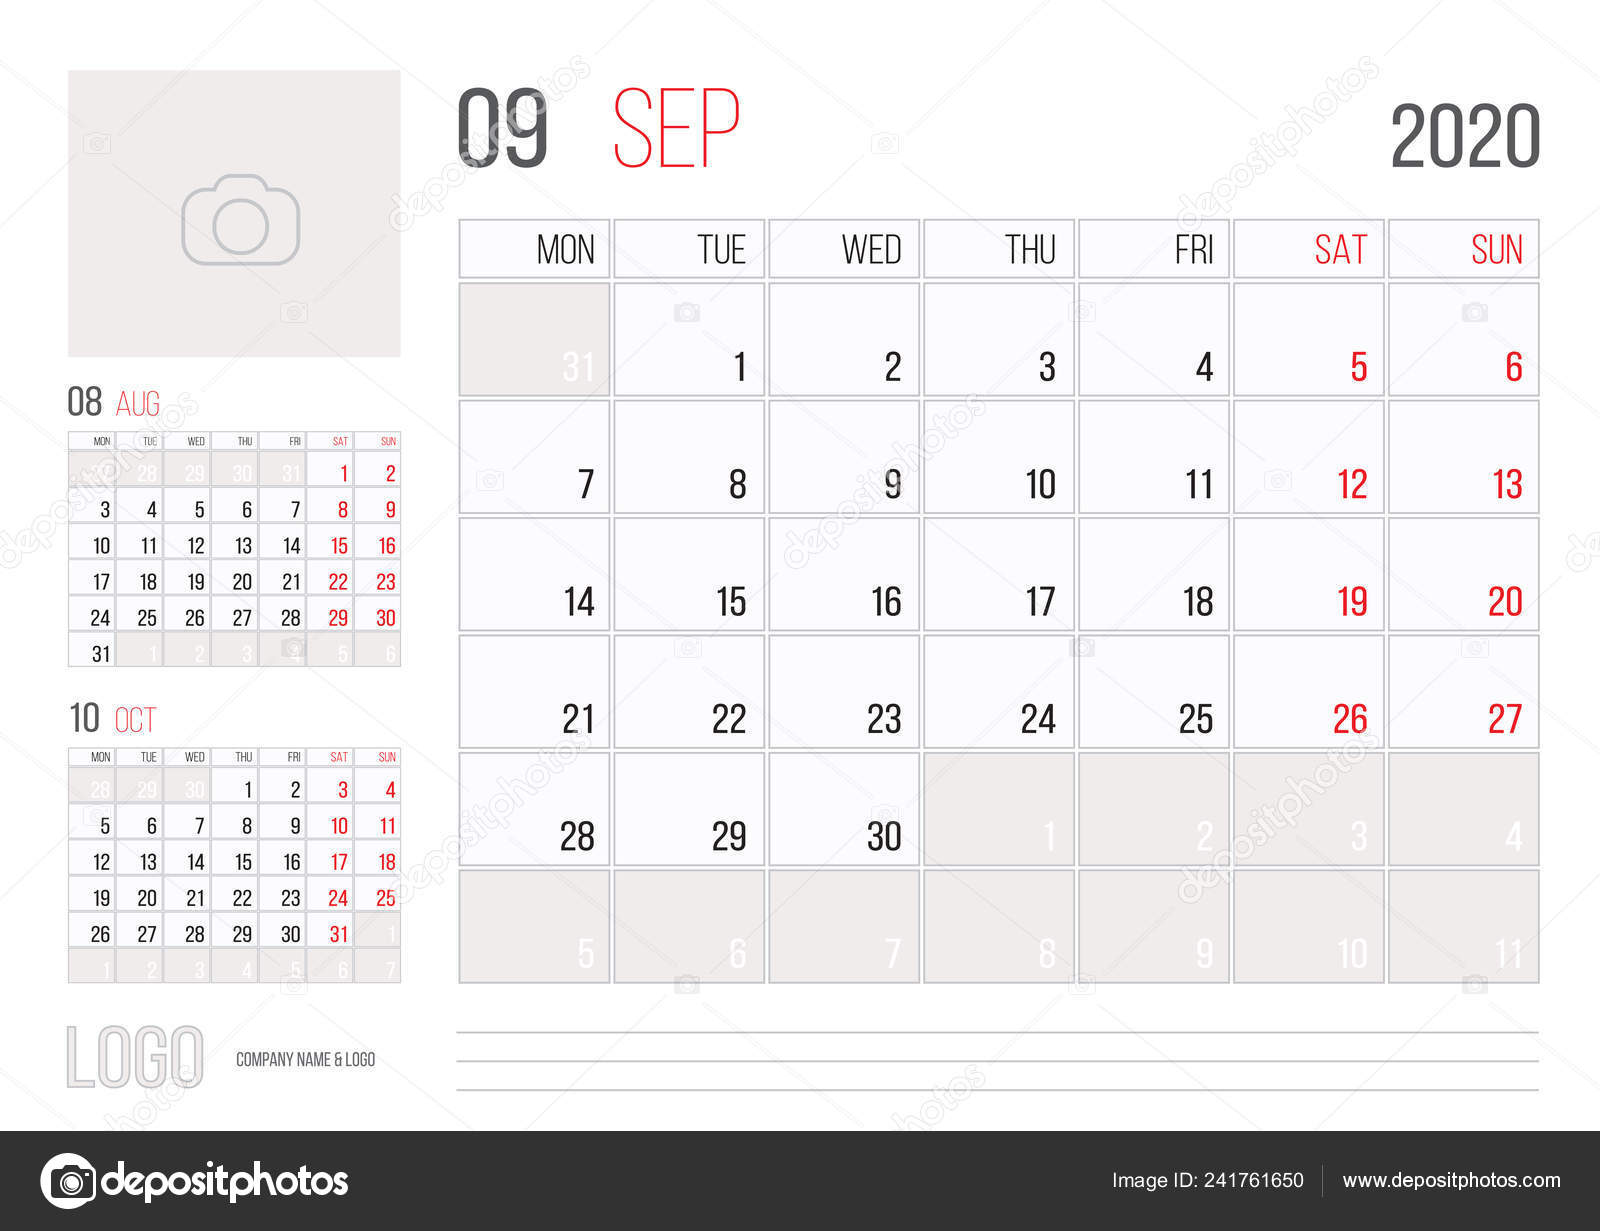 Calendario 2020 Planner.Calendar 2020 Planner Corporate Template Design September